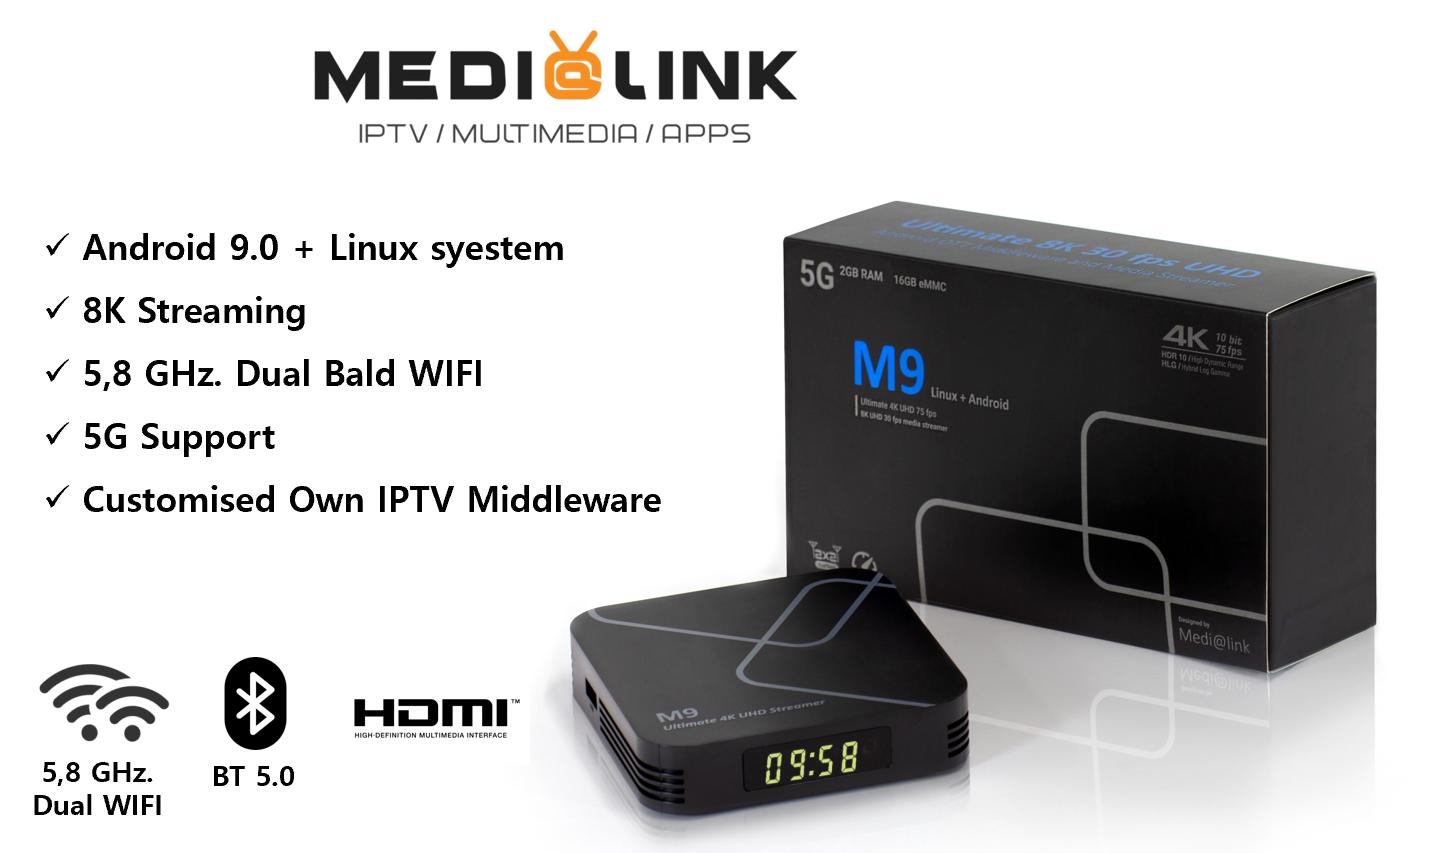 Medialink M9 8K 4K Ultra HD 5G Dual WiFi Bluetooth HDR10 Android 9.0 + Linux Internet TV IP Schwarz